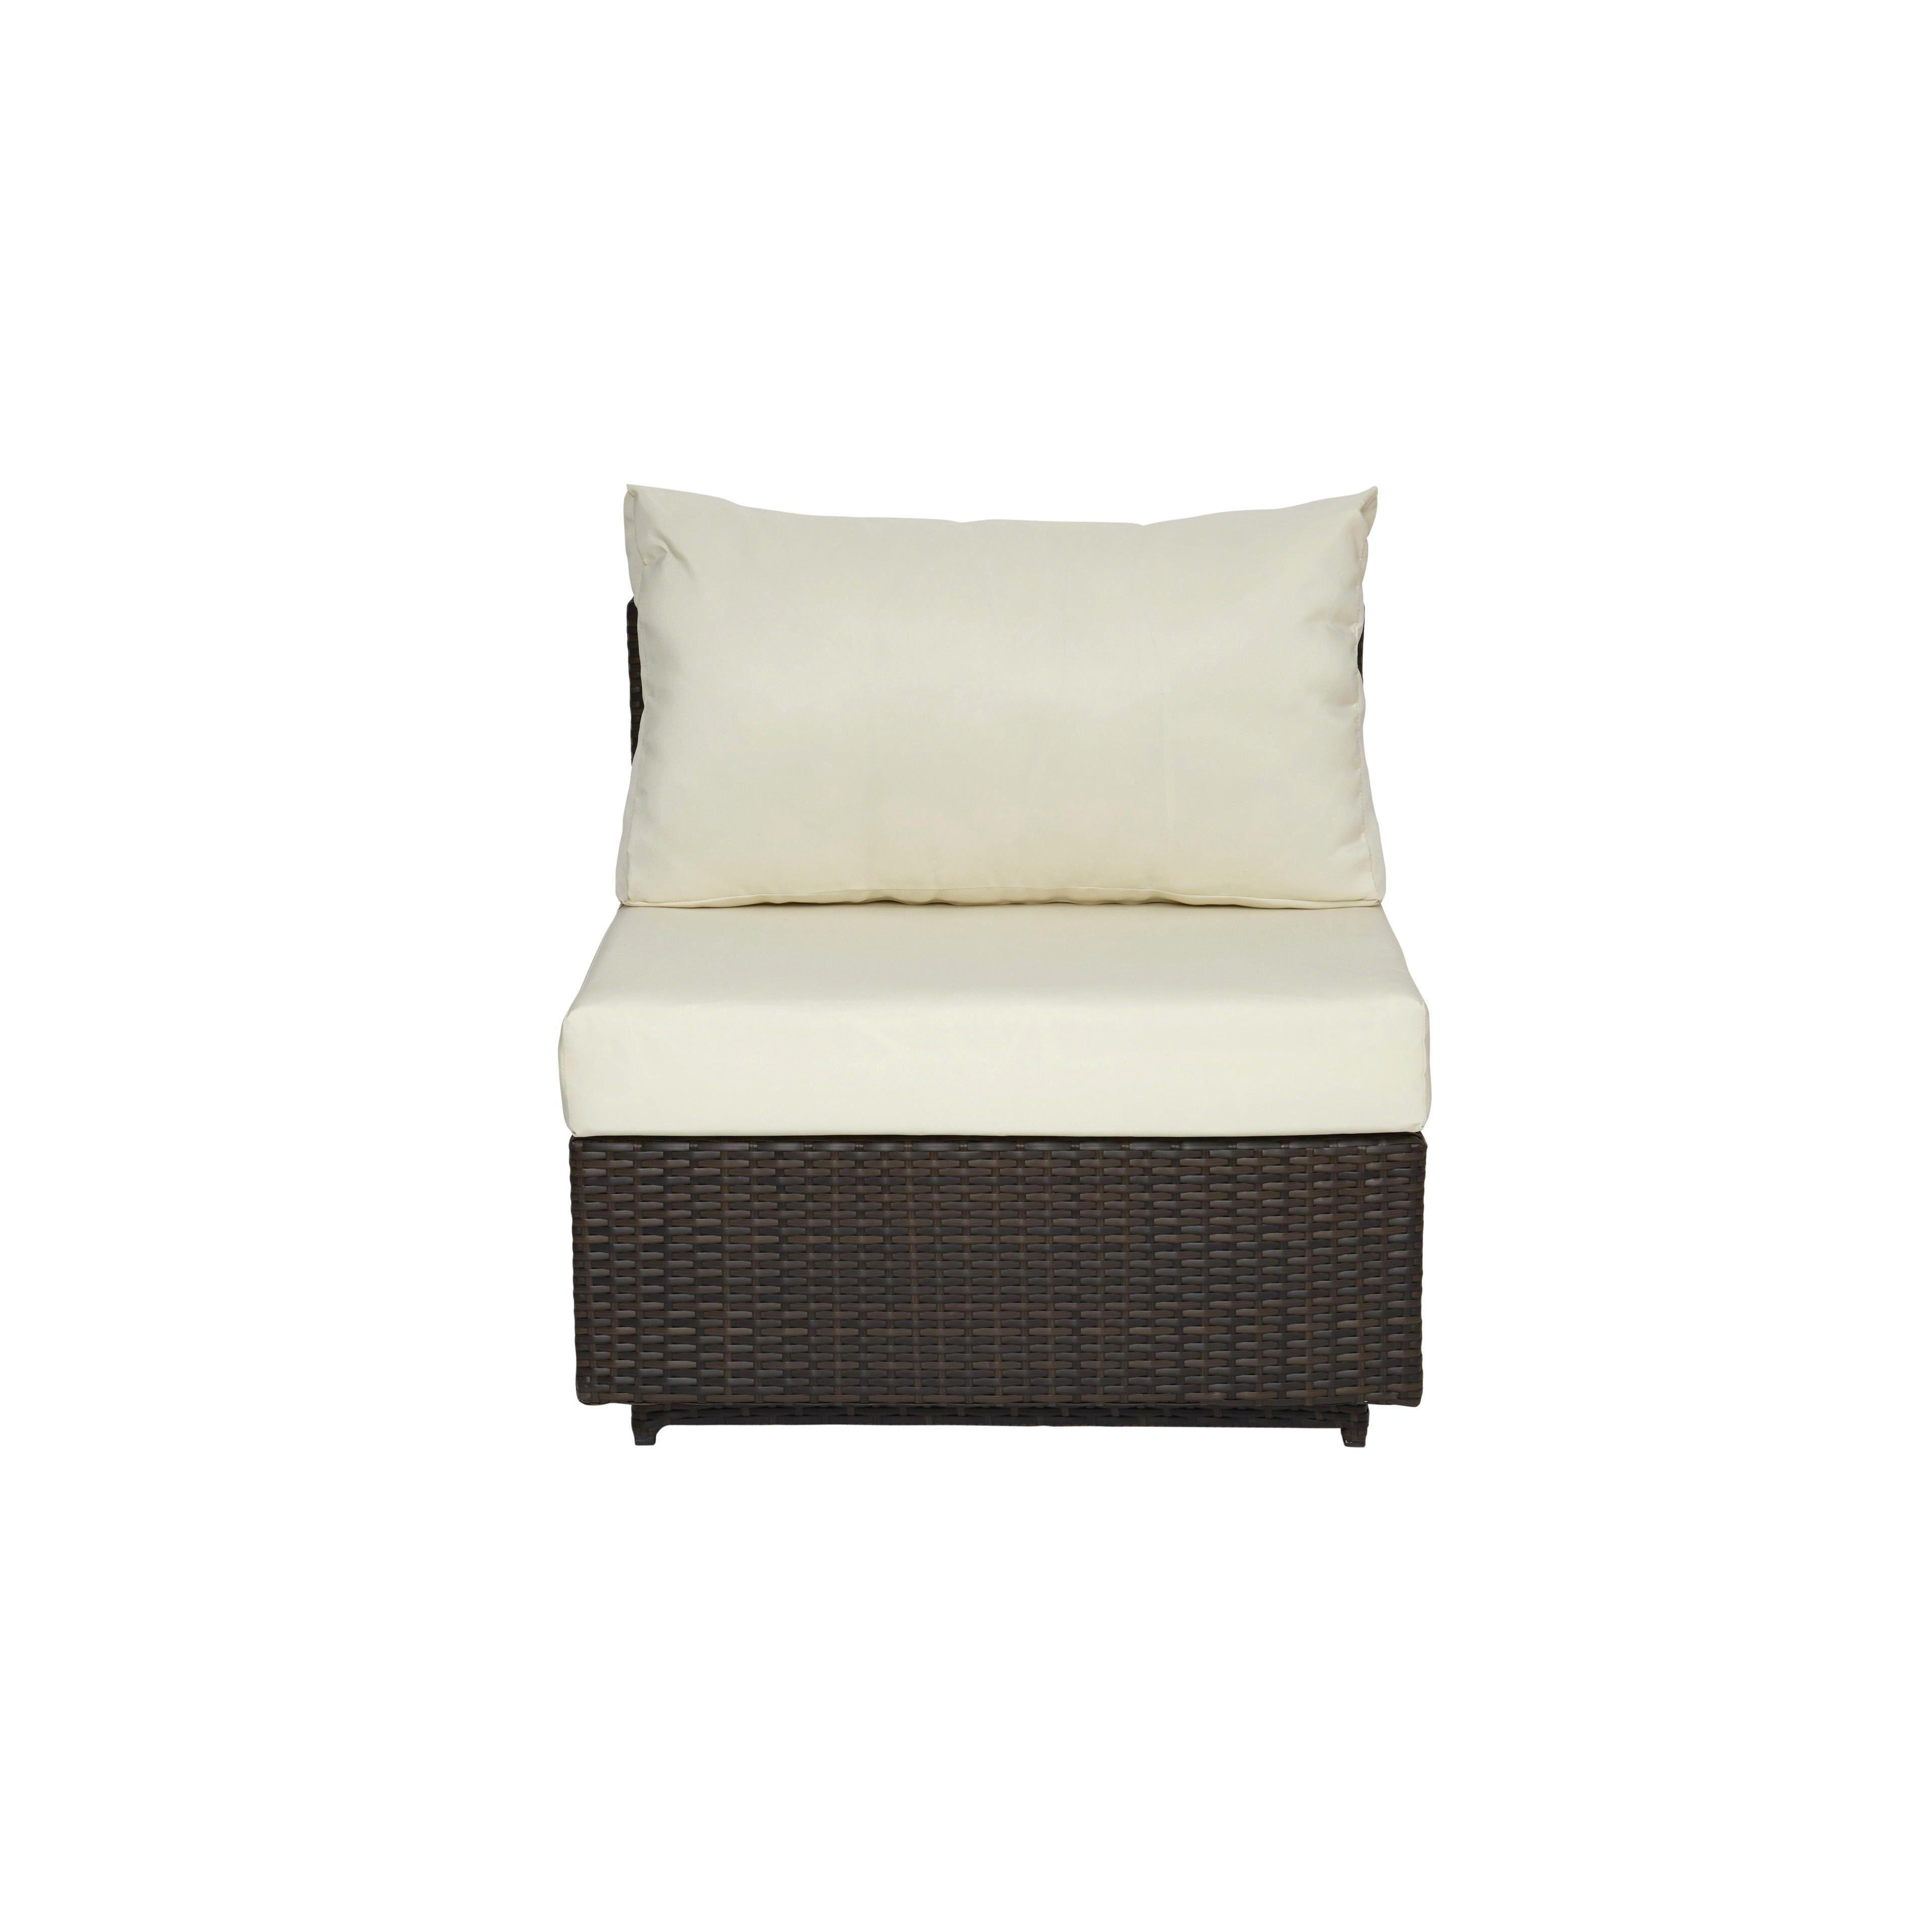 fauteuil de jardin en r sine. Black Bedroom Furniture Sets. Home Design Ideas